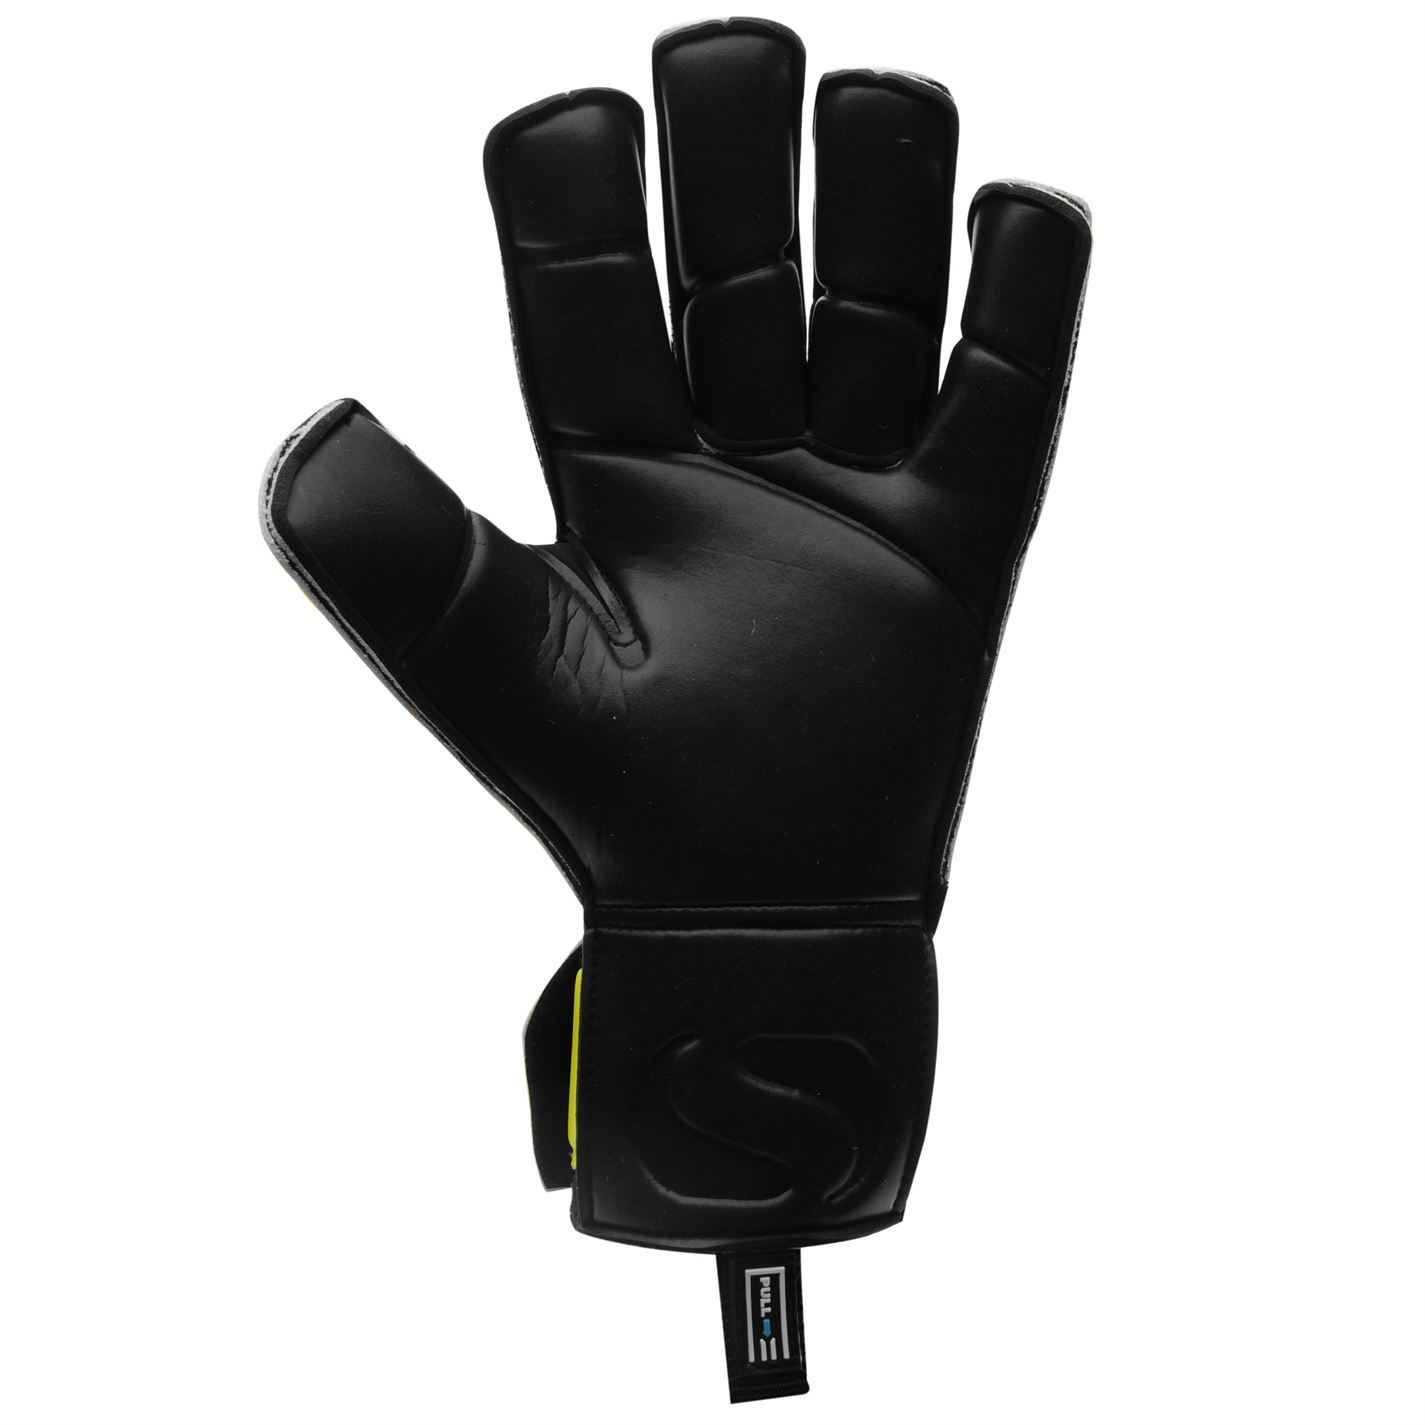 Sondico Aerolite Goalkeeper Gloves Mens (832004-83200490) - Woomie.gr 99110d6dc58